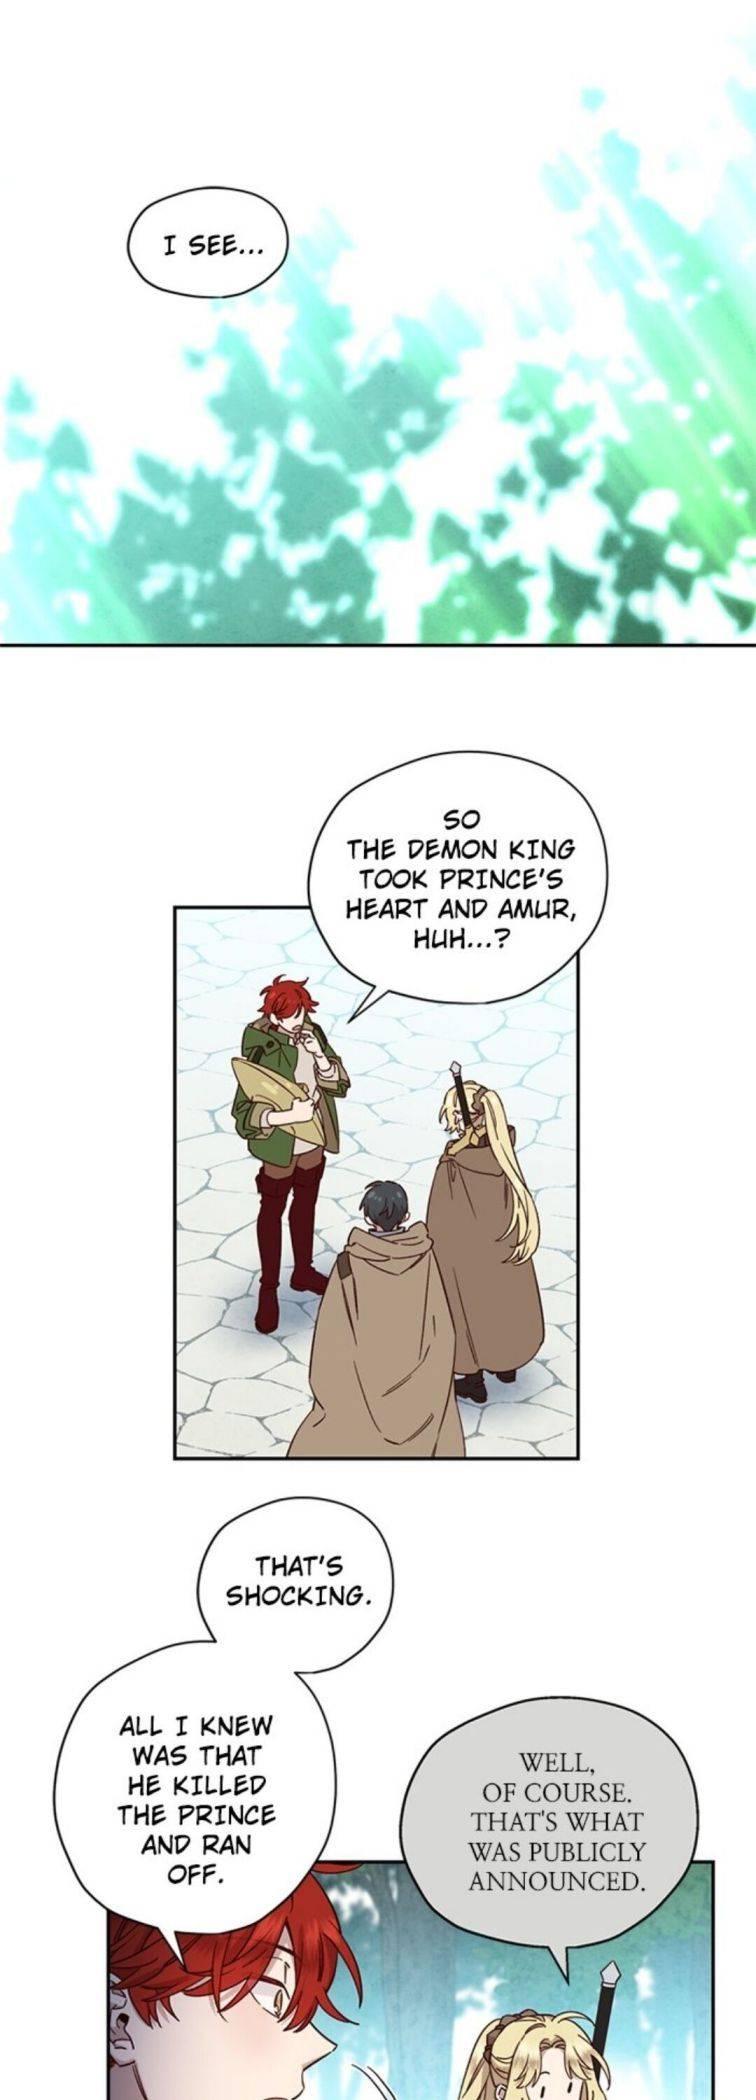 https://manga.mangadogs.com/comics/pic4/42/46314/3266264/6299f7b7e197e0a3cfb007c2c0b12a20.jpg Page 1